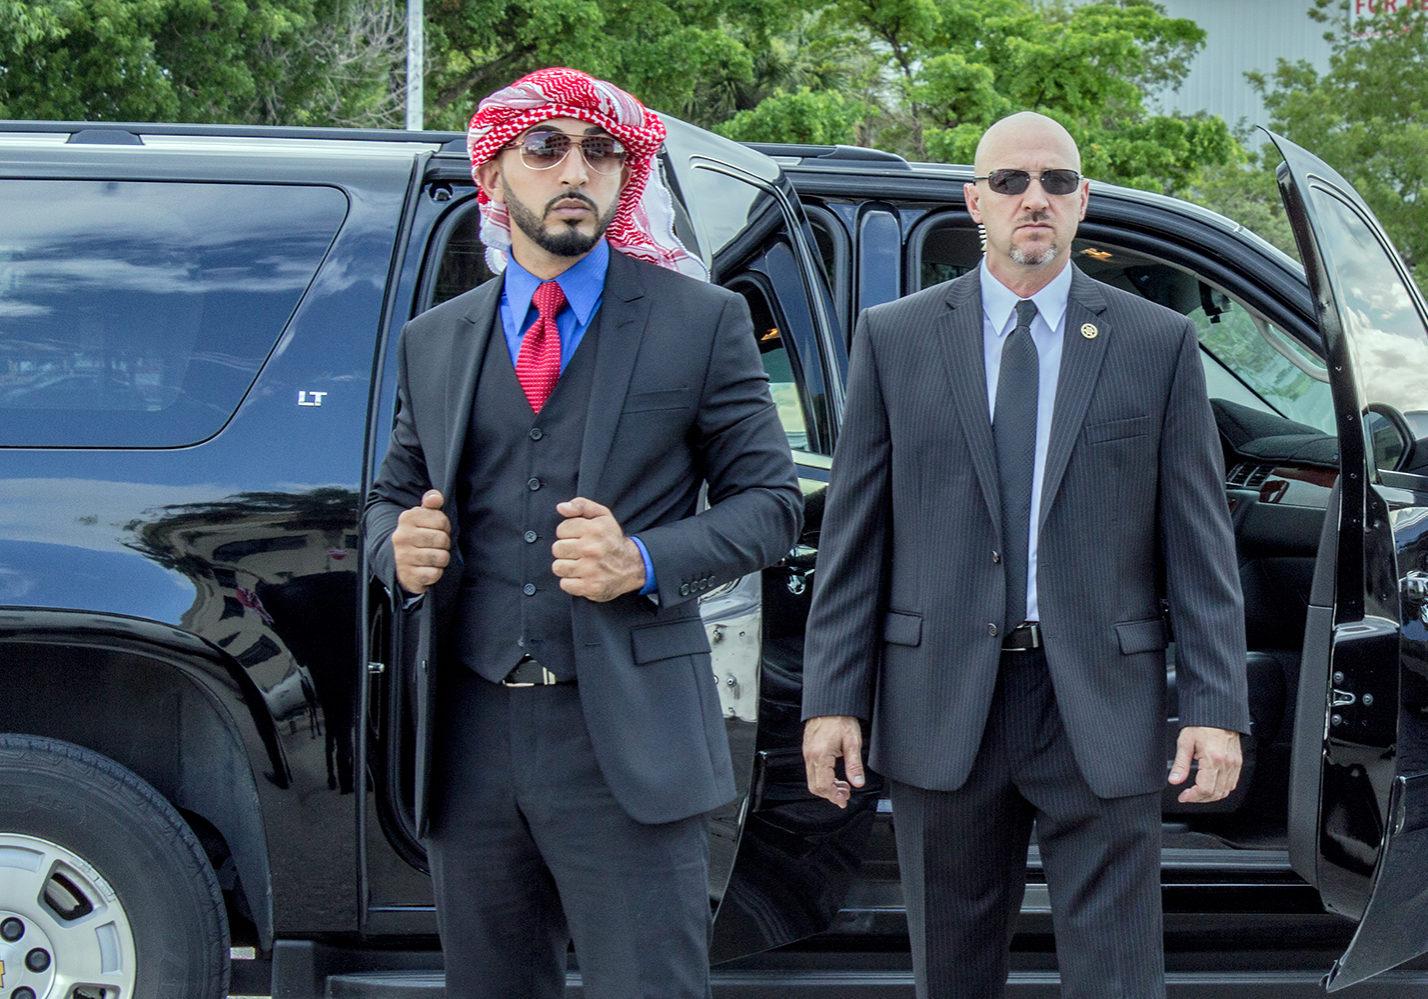 Executive Protection Services - Florida Investigations